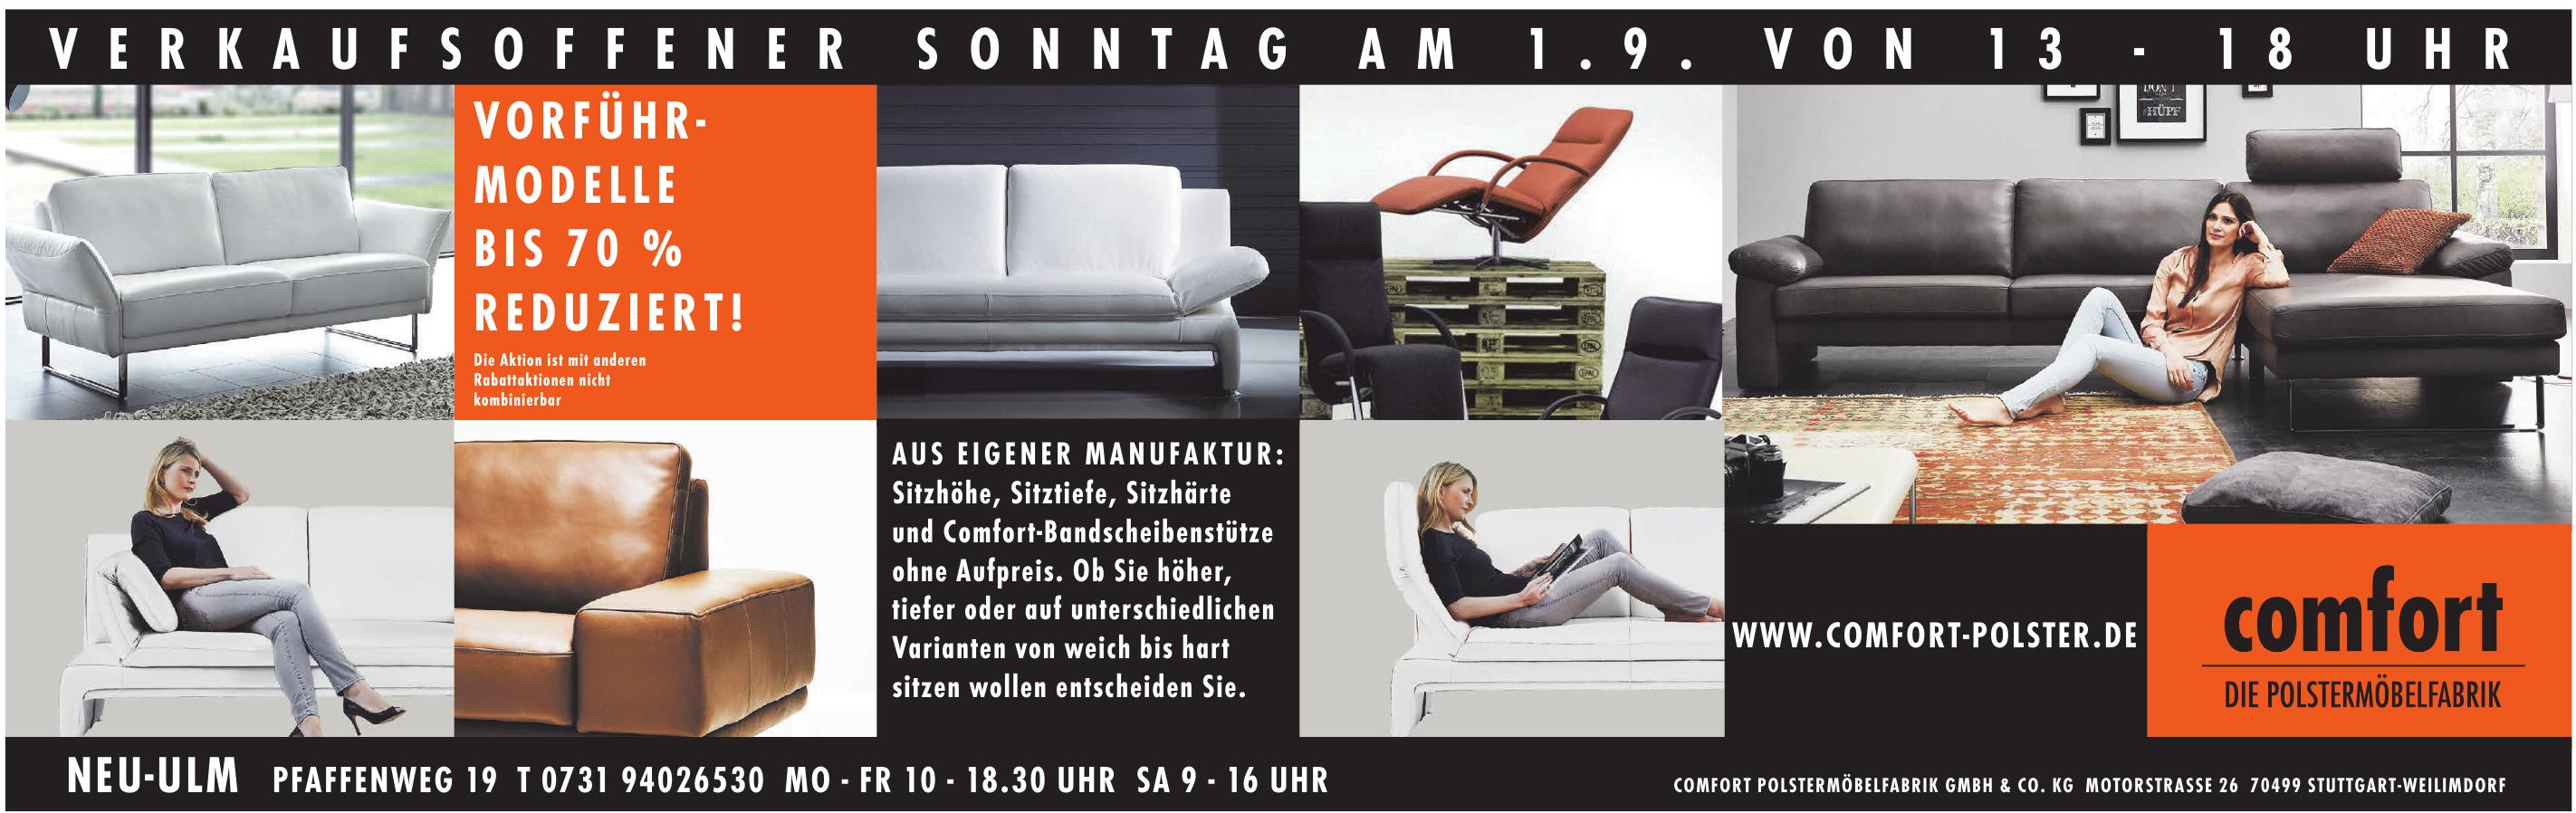 comfort GmbH & Co. KG